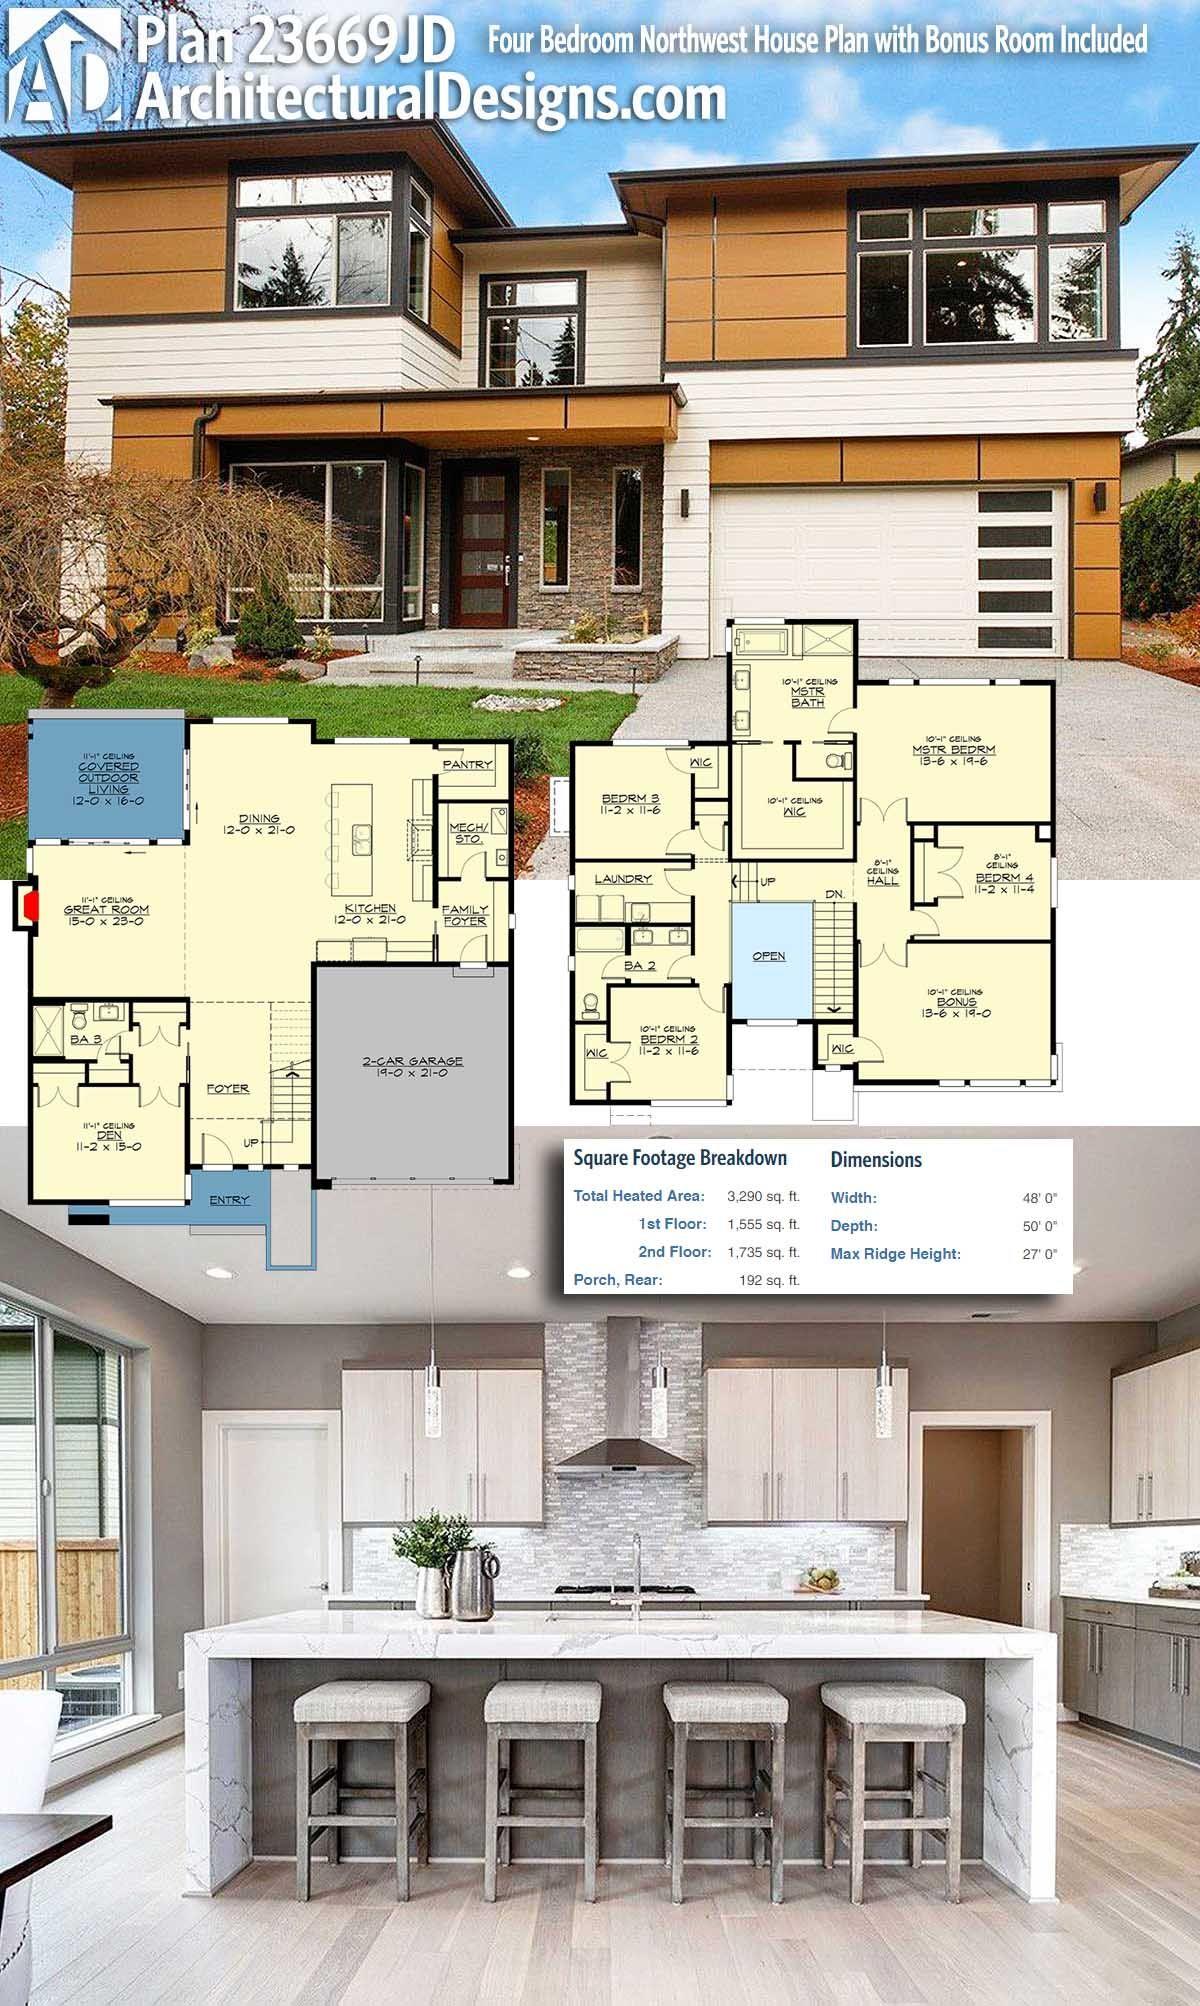 Plan 23669jd Four Bedroom Northwest House Plan With Bonus Room Included Modern House Plans Modern House Design Sims House Plans